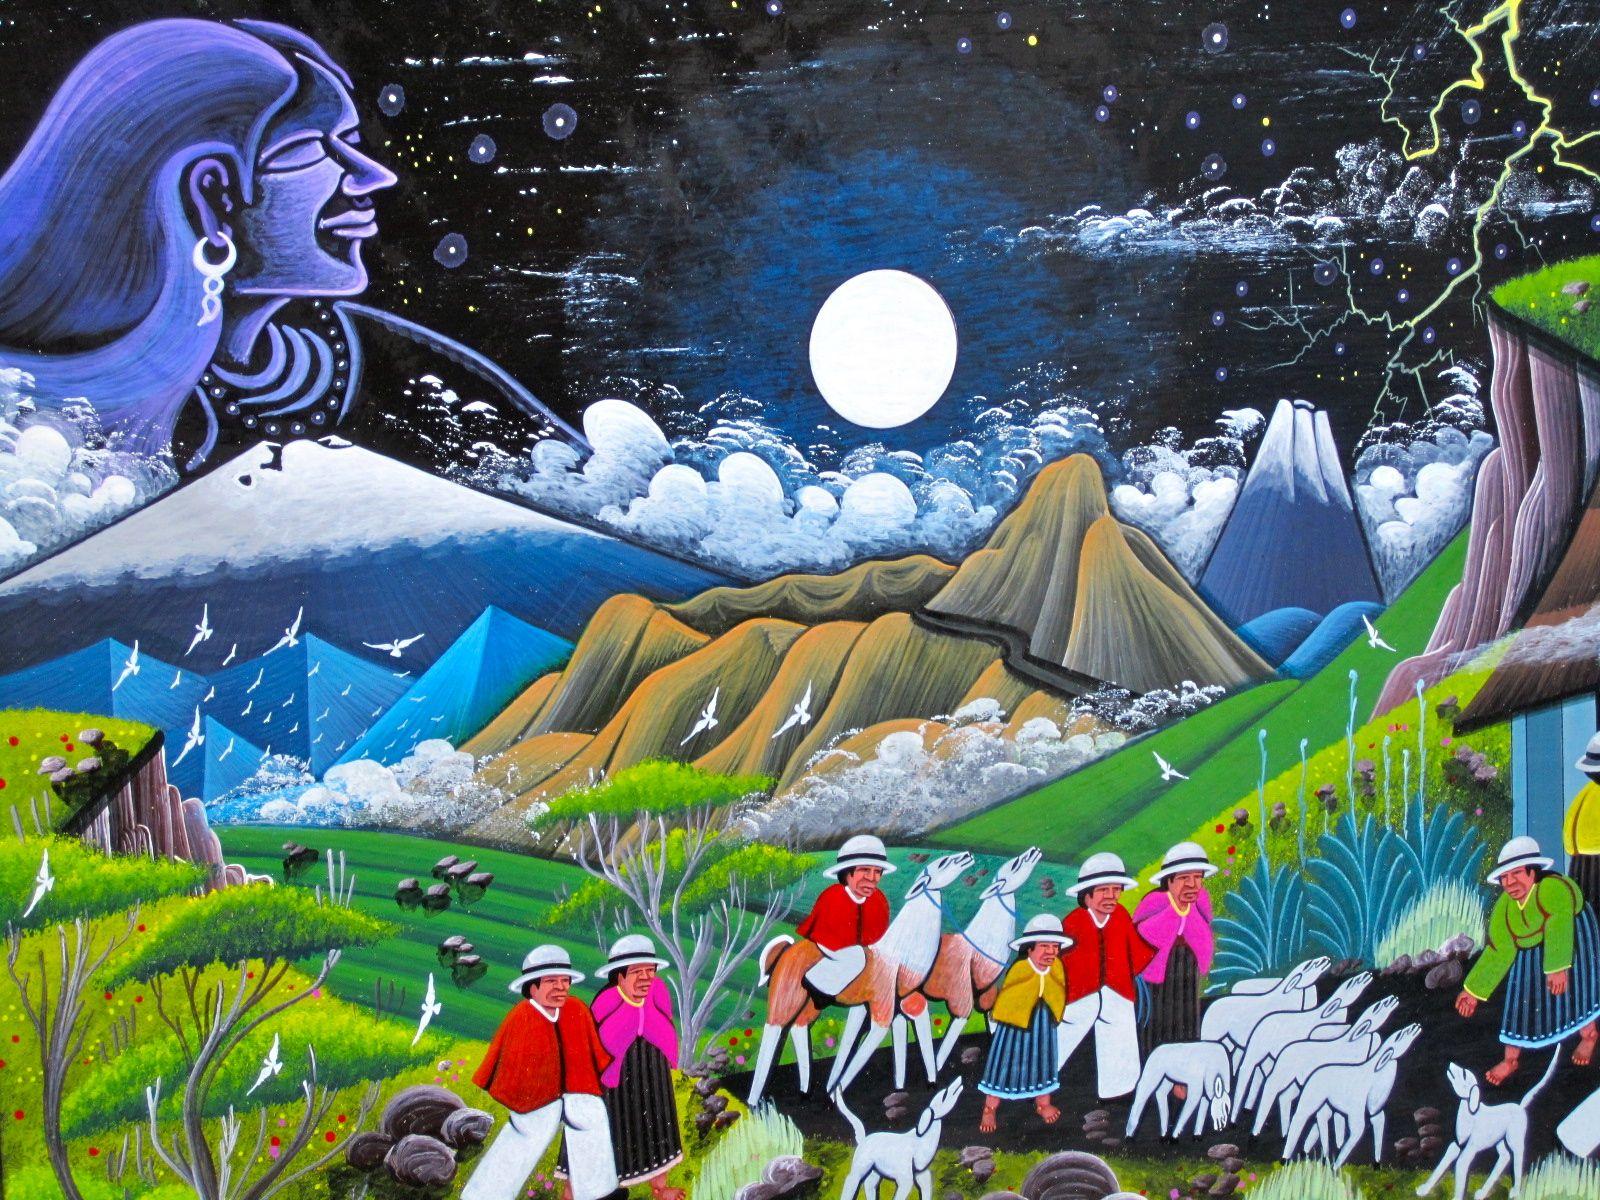 Words of all kinds.: Ecuadorian Art: Oswaldo Guayasamin | Artist ...